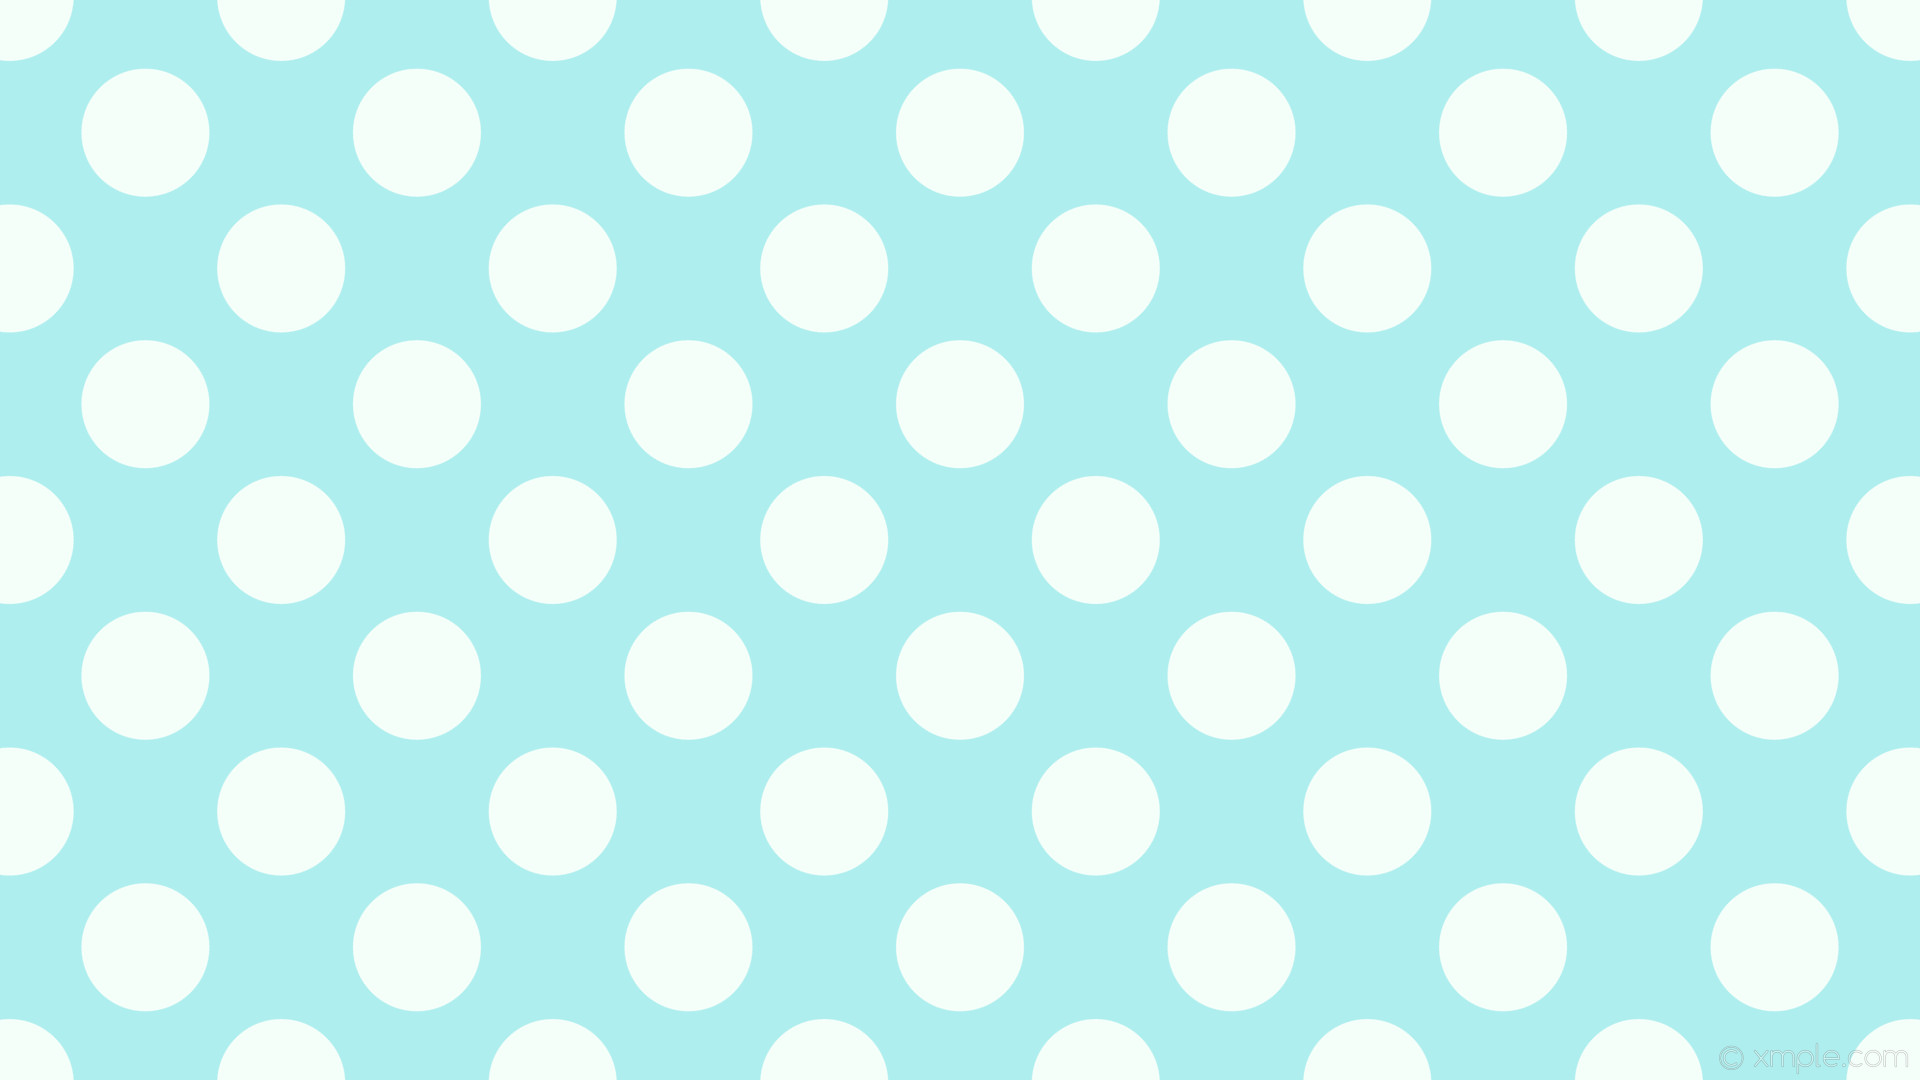 wallpaper white dots blue spots polka pale turquoise mint cream #afeeee  #f5fffa 315°